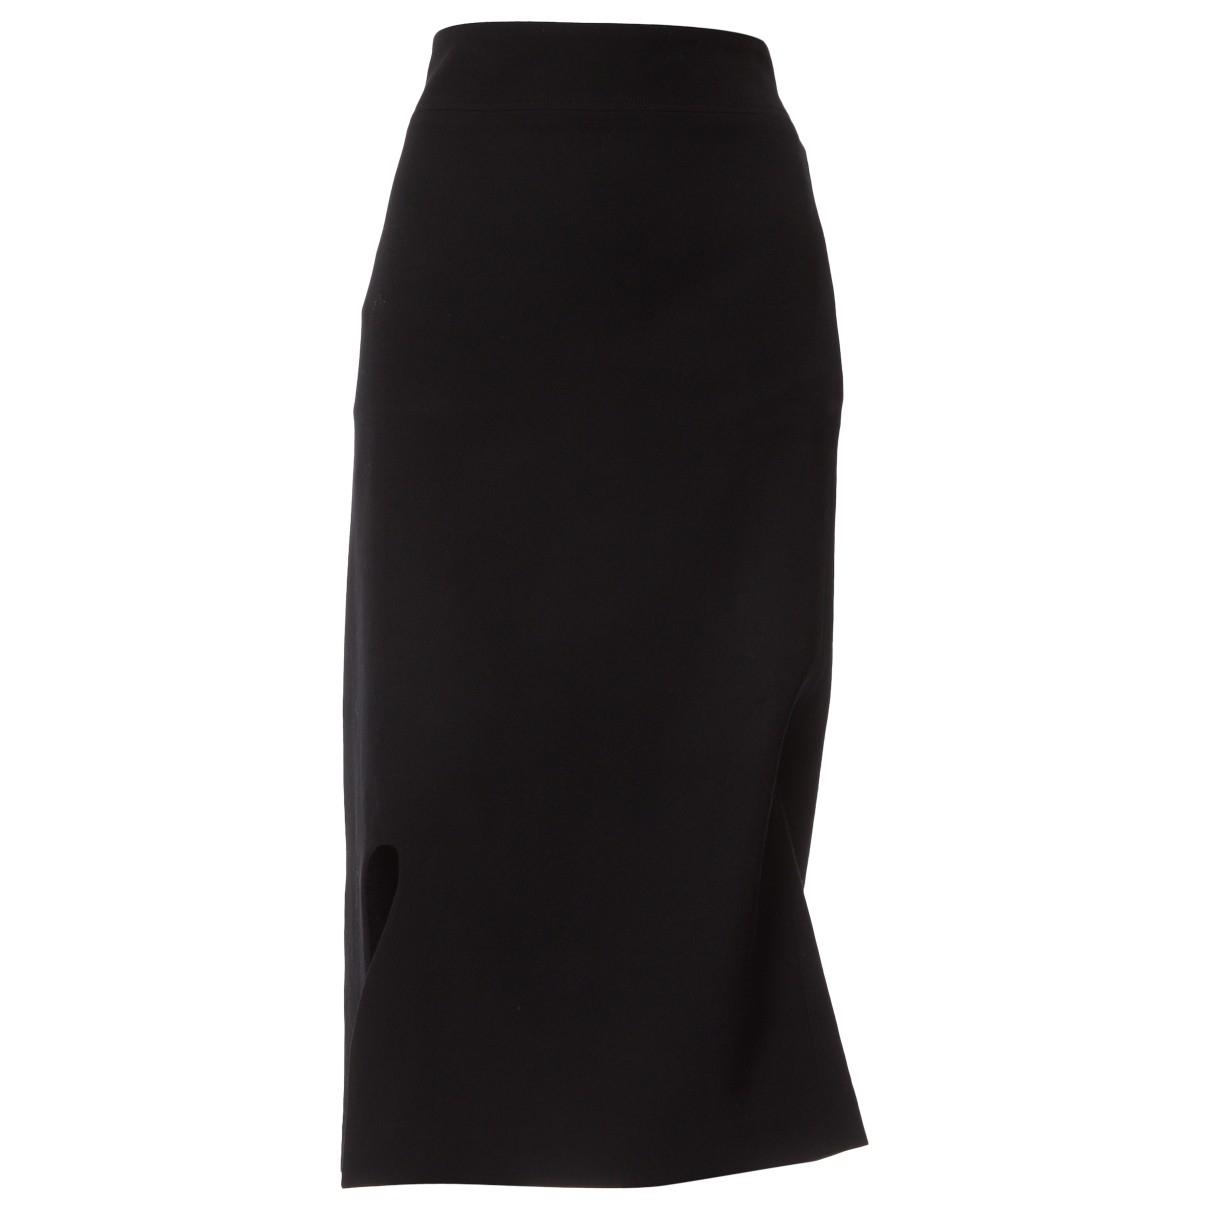 Yohji Yamamoto \N Black Wool skirt for Women 1 0-5